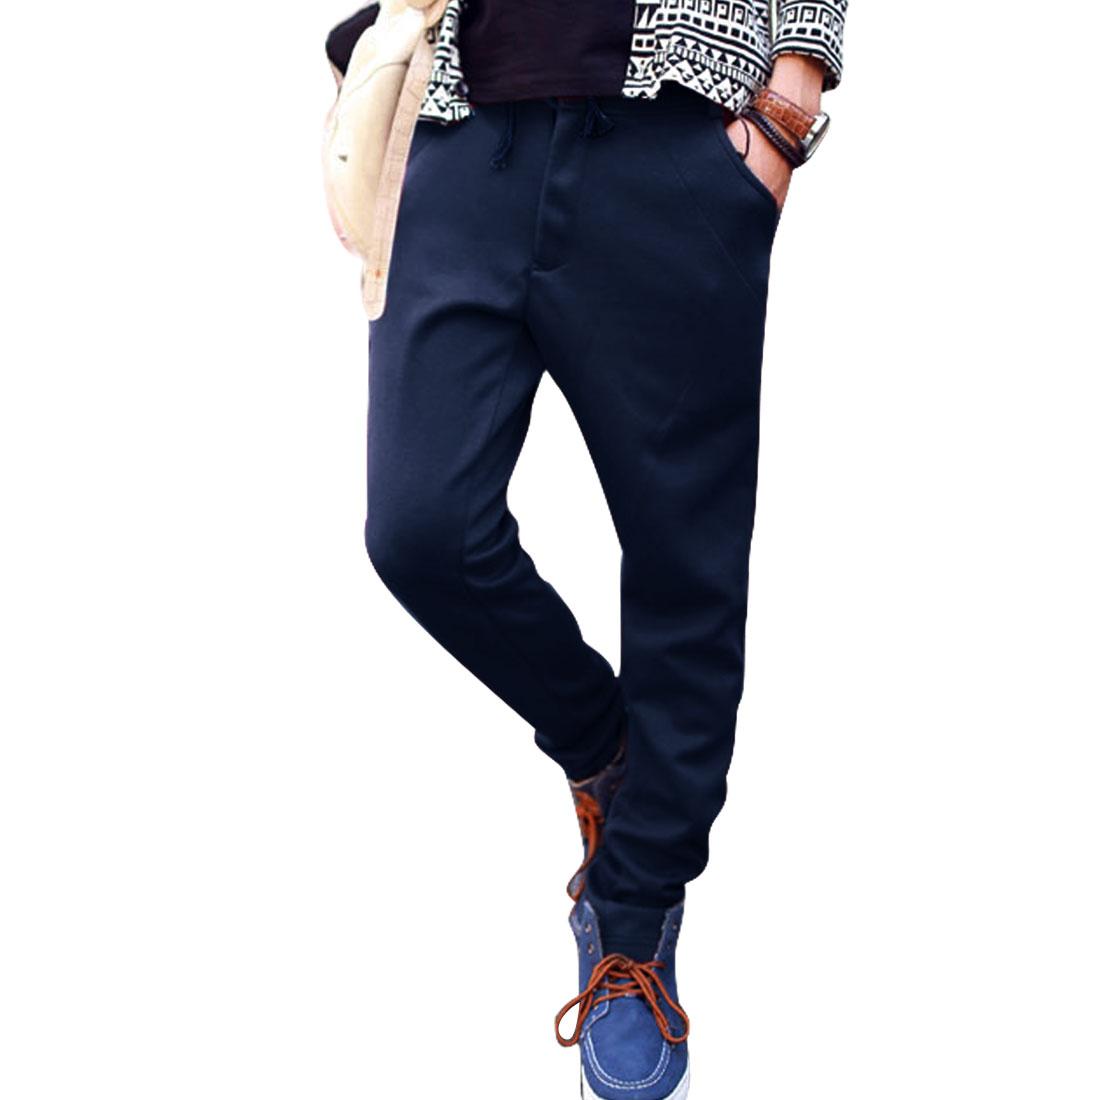 Fashion Dark Blue Belt Loops Drawstring Hand Pockets Pants for Man W32